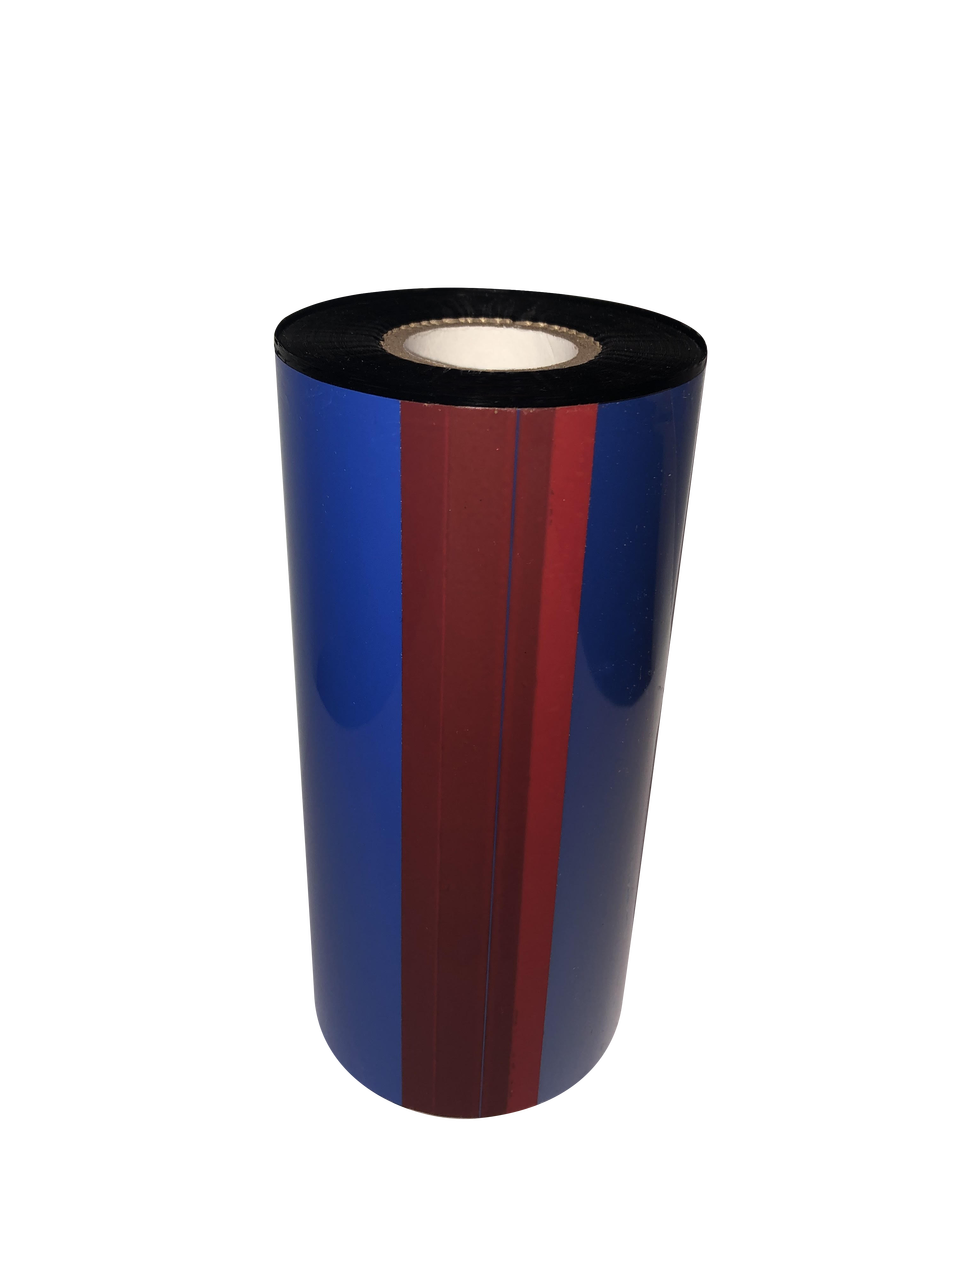 "NOVEXX 64-X SERIES 5.12""x1312 ft M295HD High Density Near Edge Wax/Resin-24/Ctn thermal transfer ribbon"